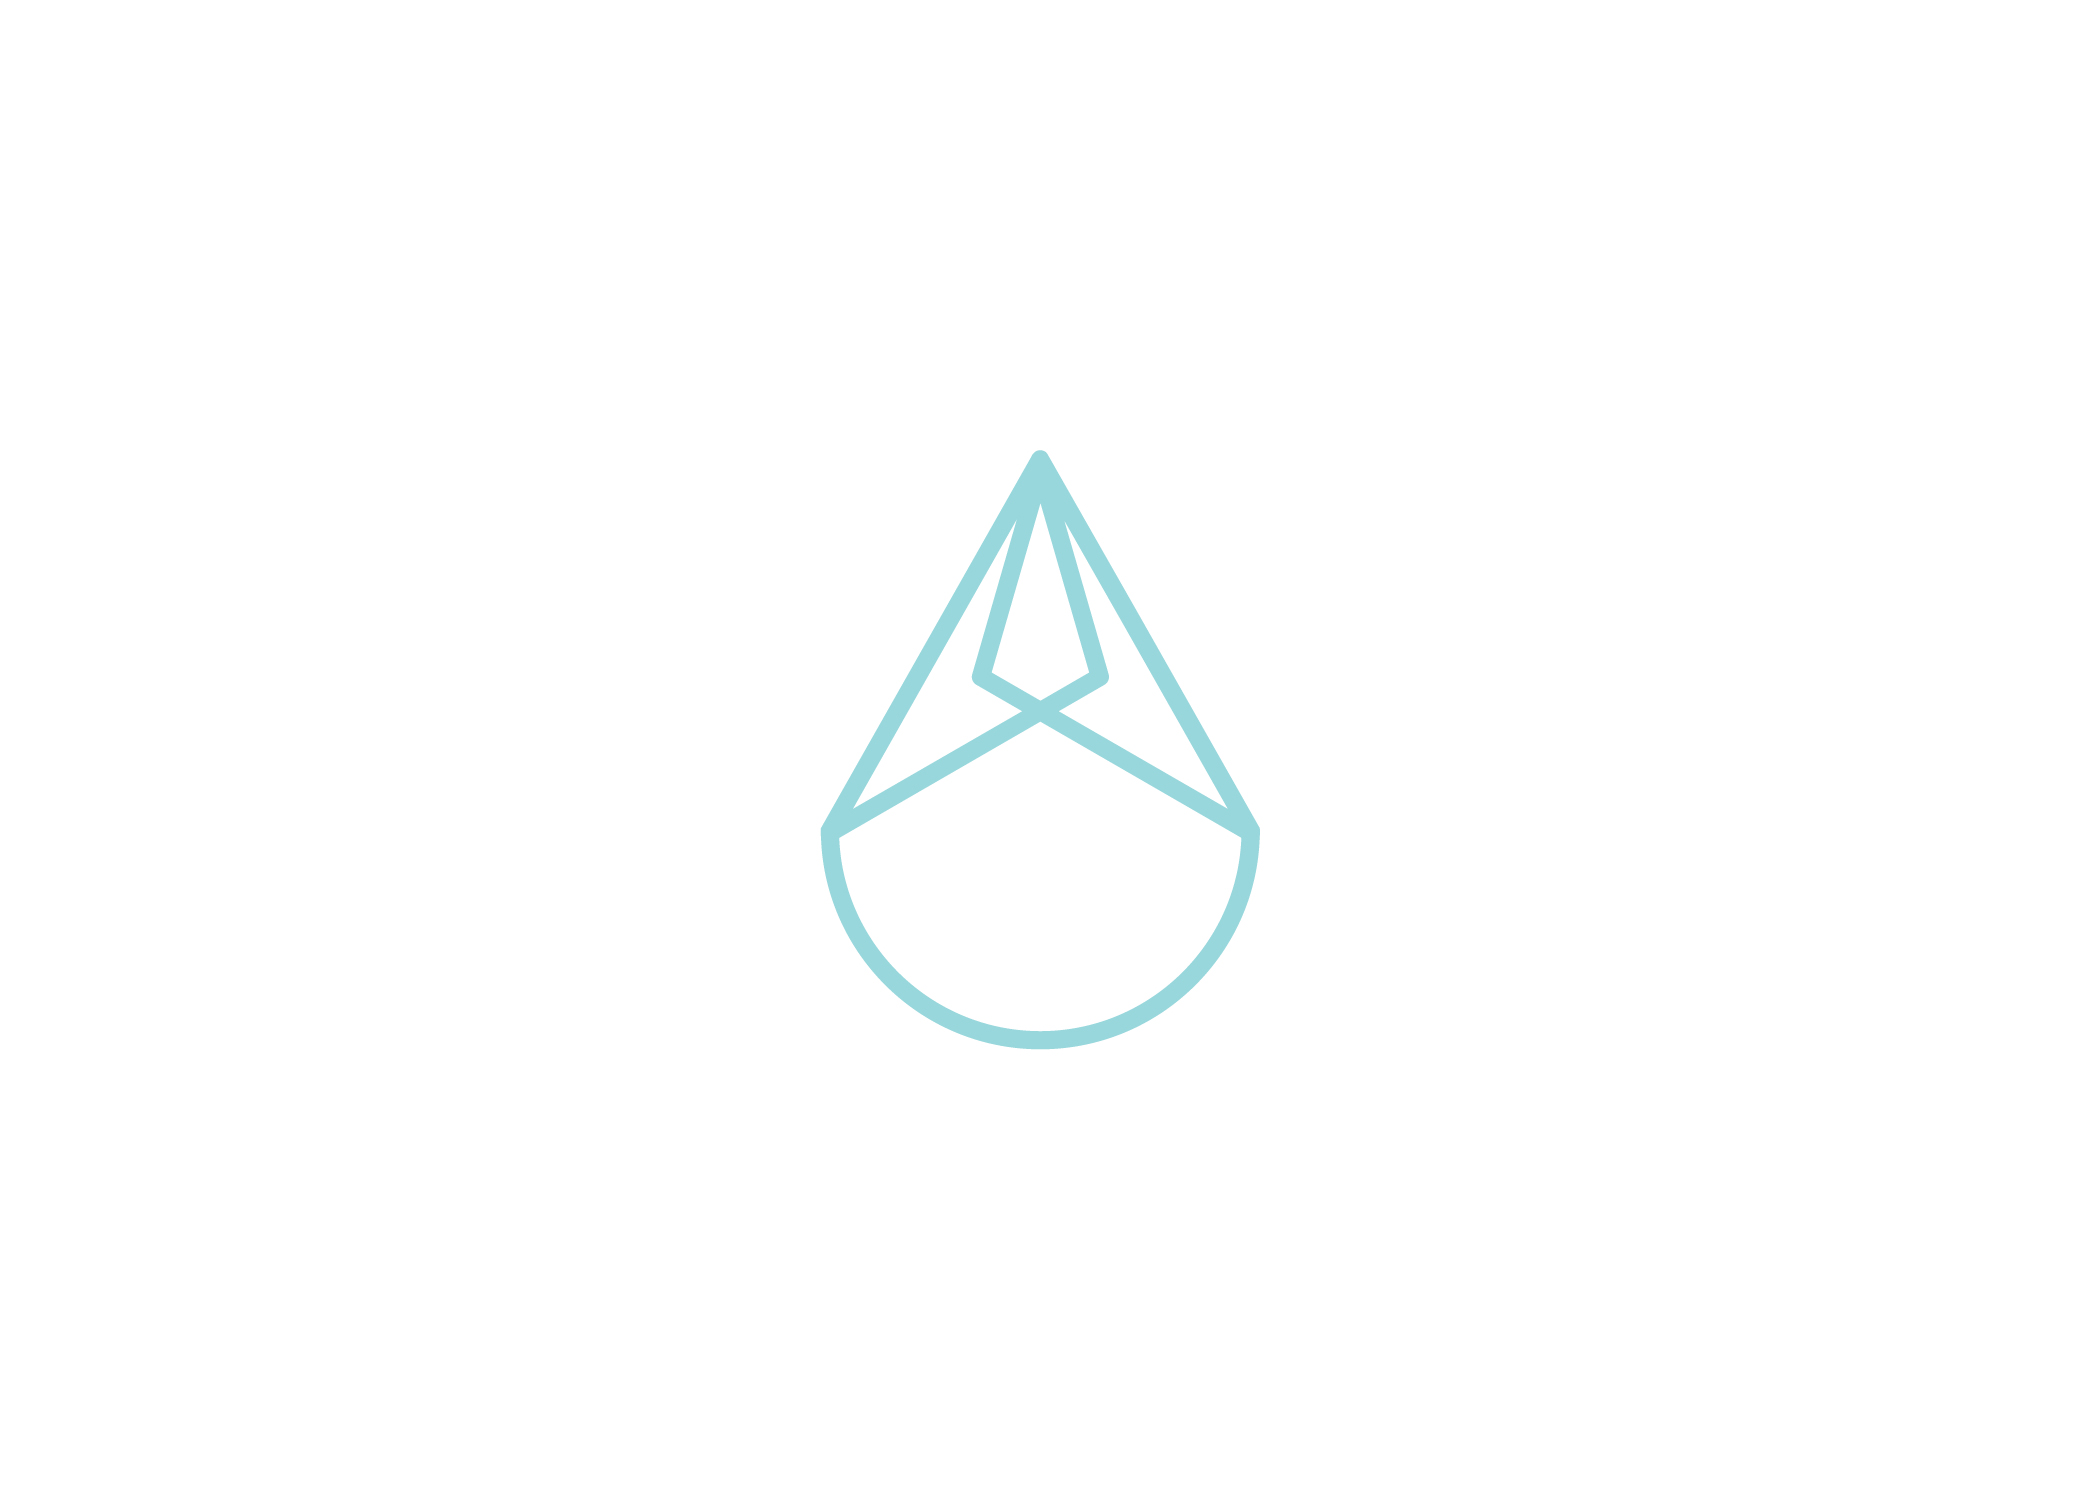 Indra logo drop design of water droplet symbol in light blue.